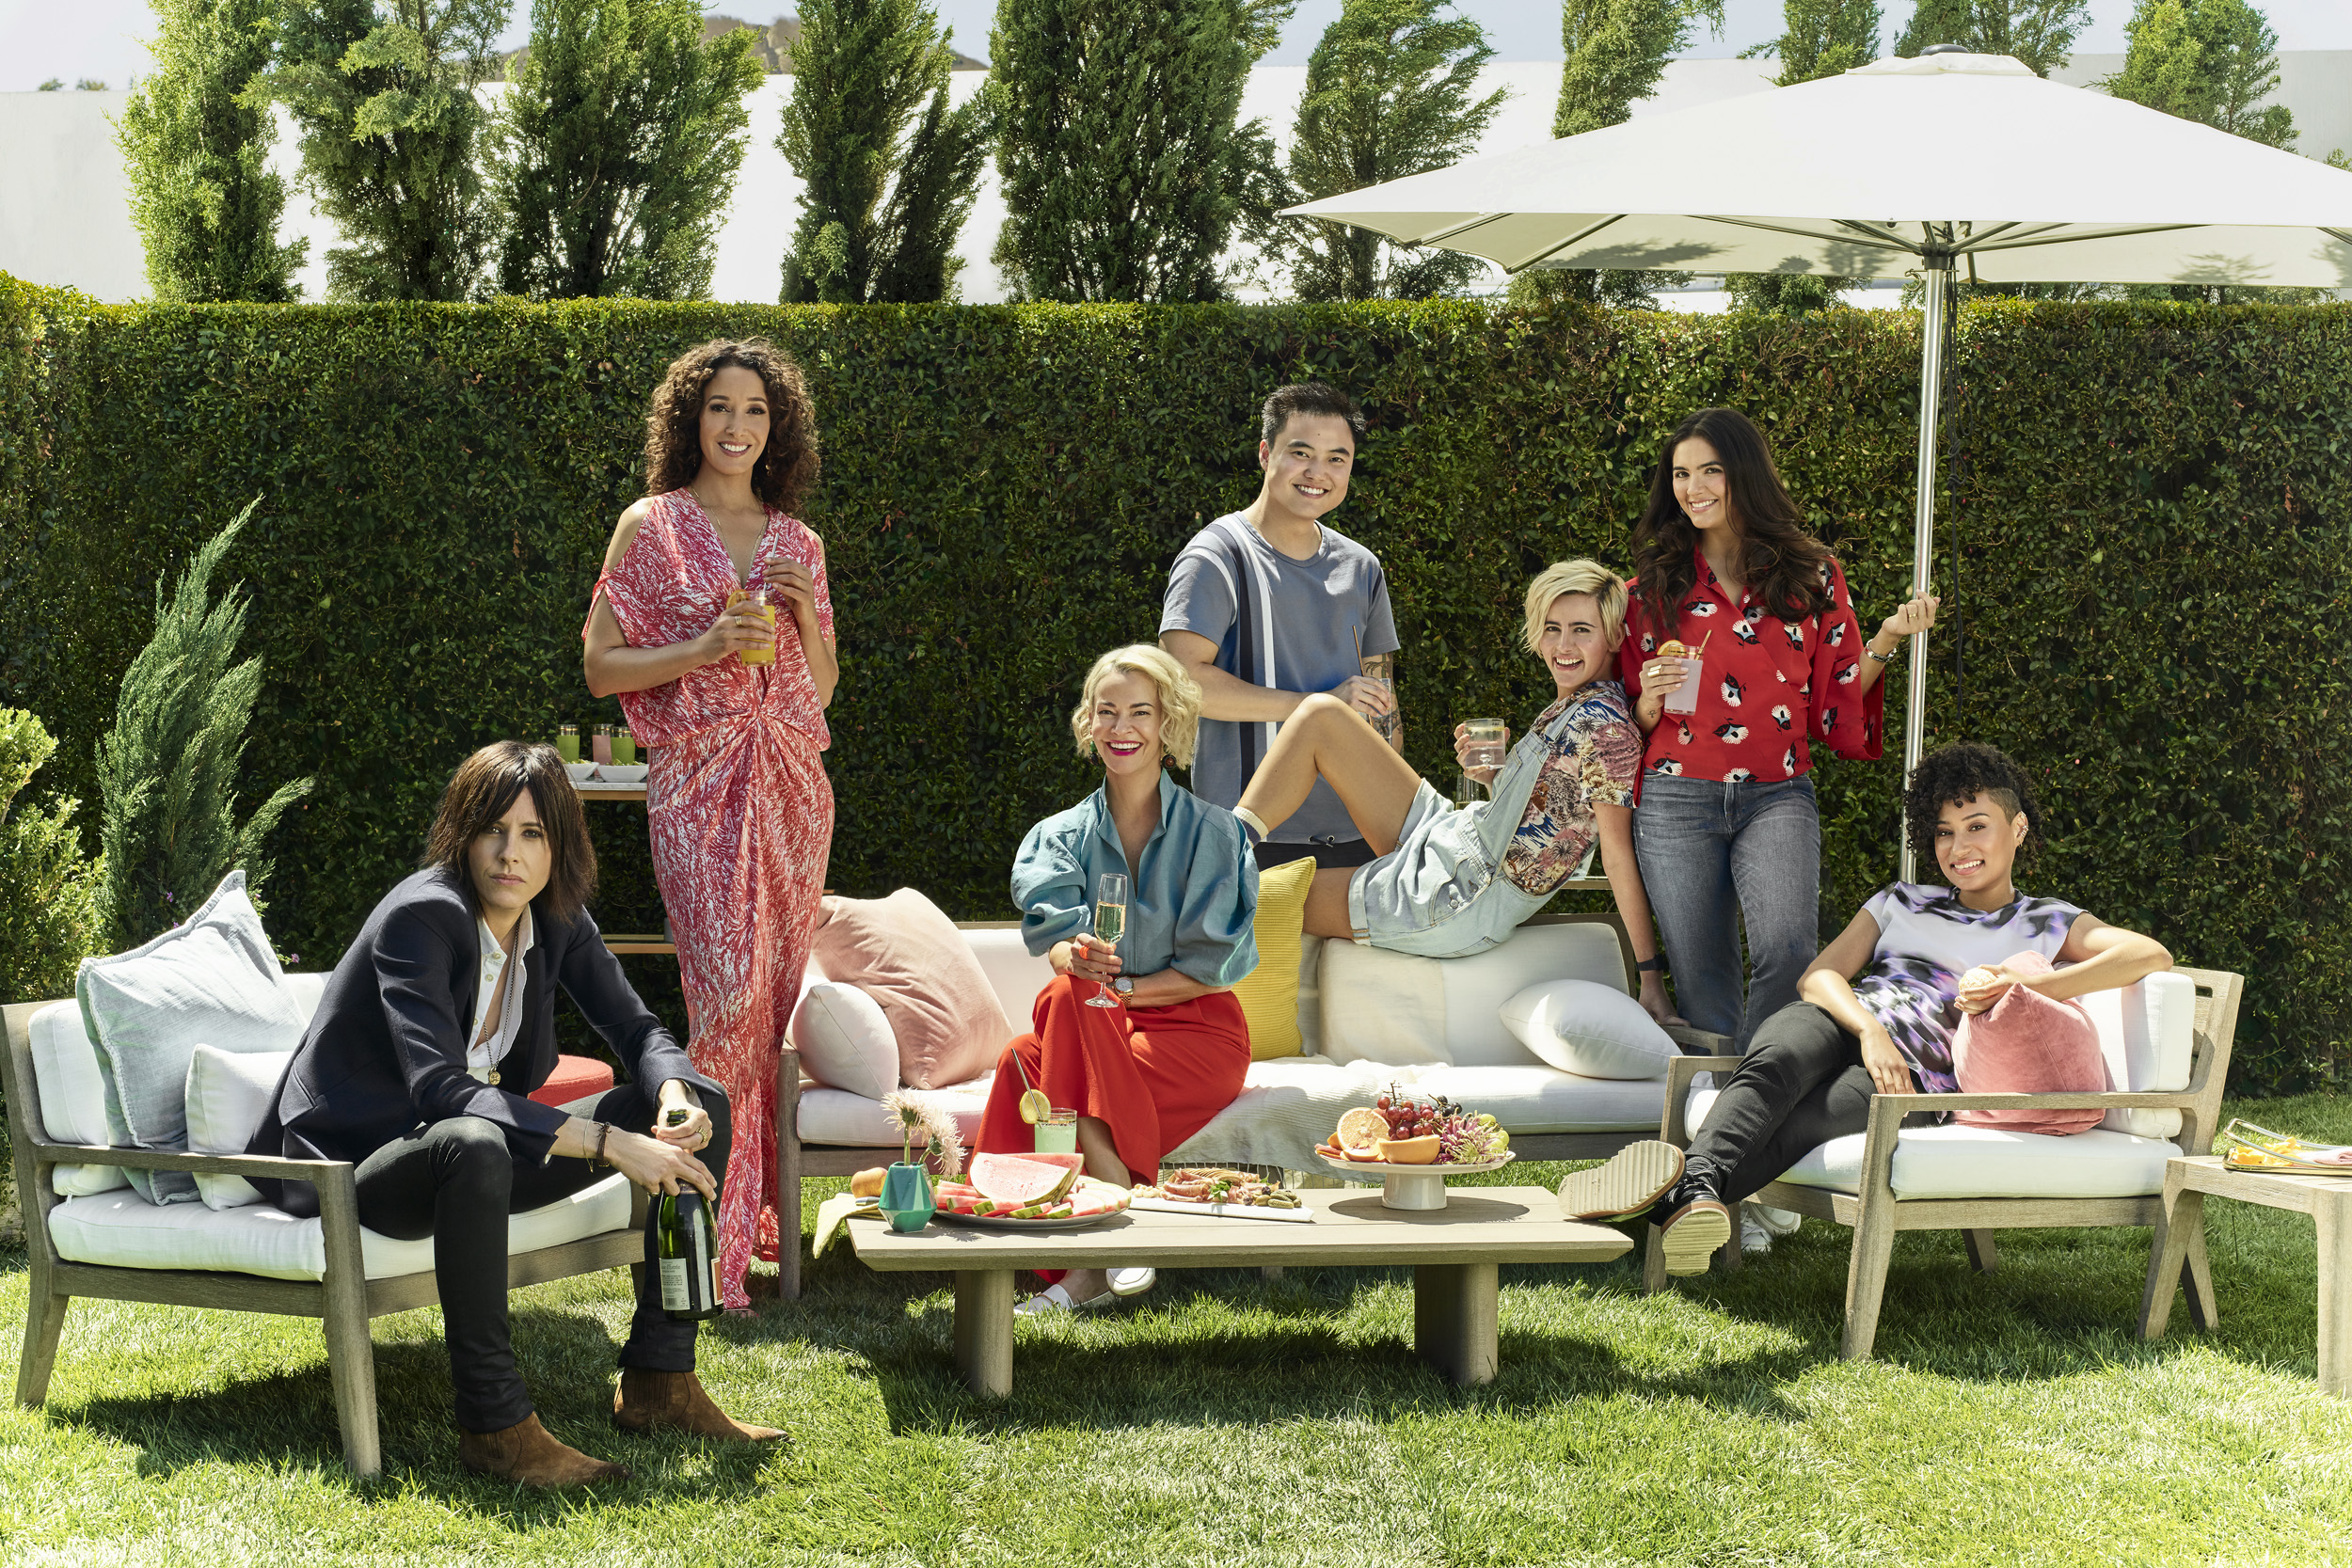 The L Word: Generation Q Season 2 on Showtime